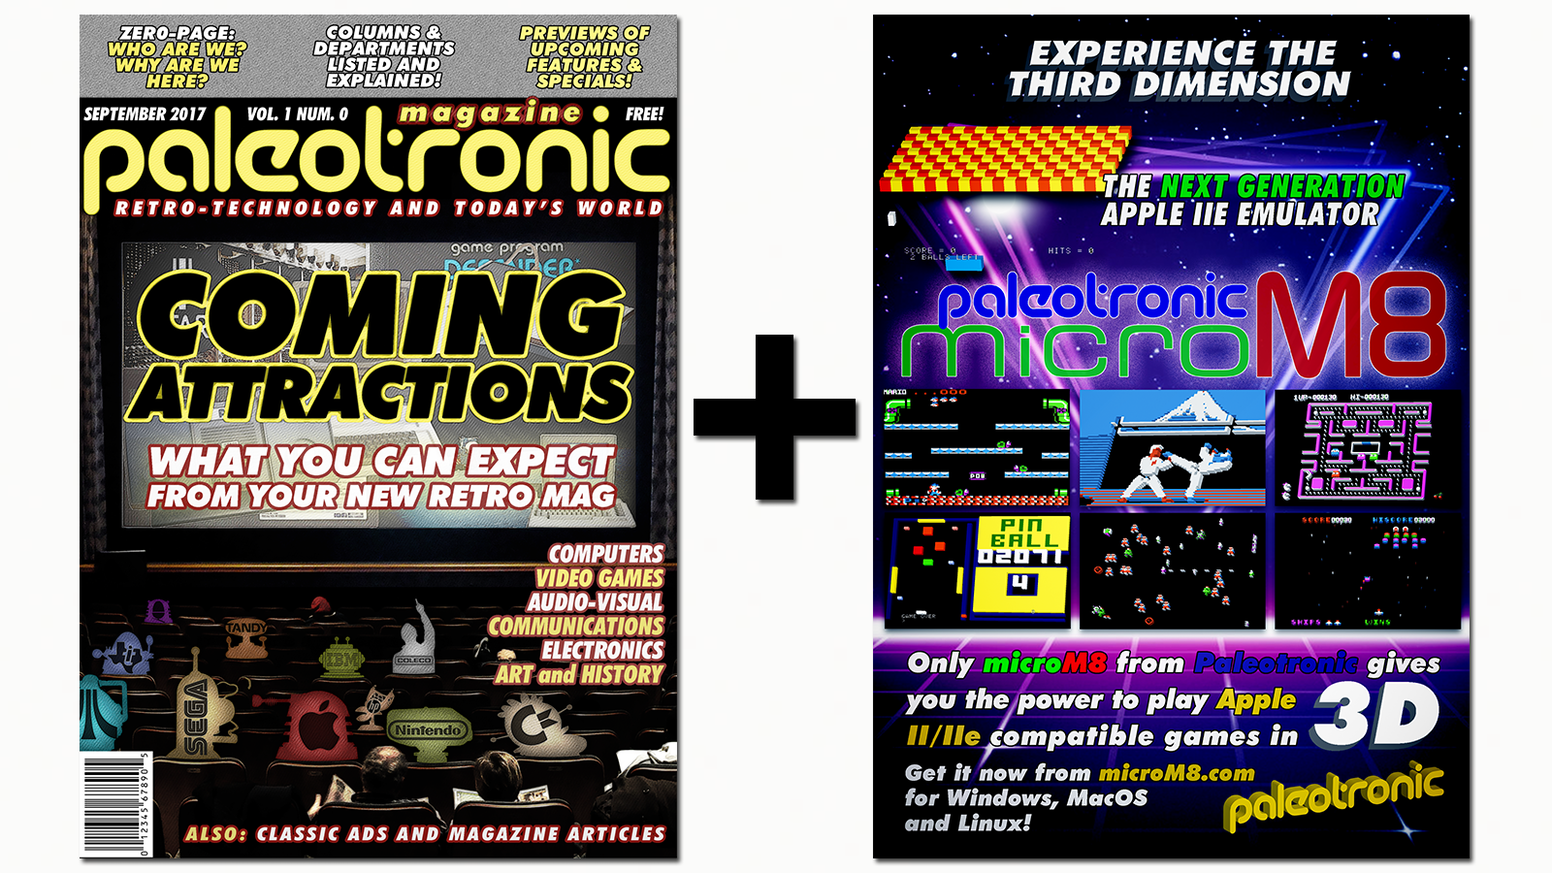 Paleotronic Retro-Technology Magazine + microM8 3D Emulator